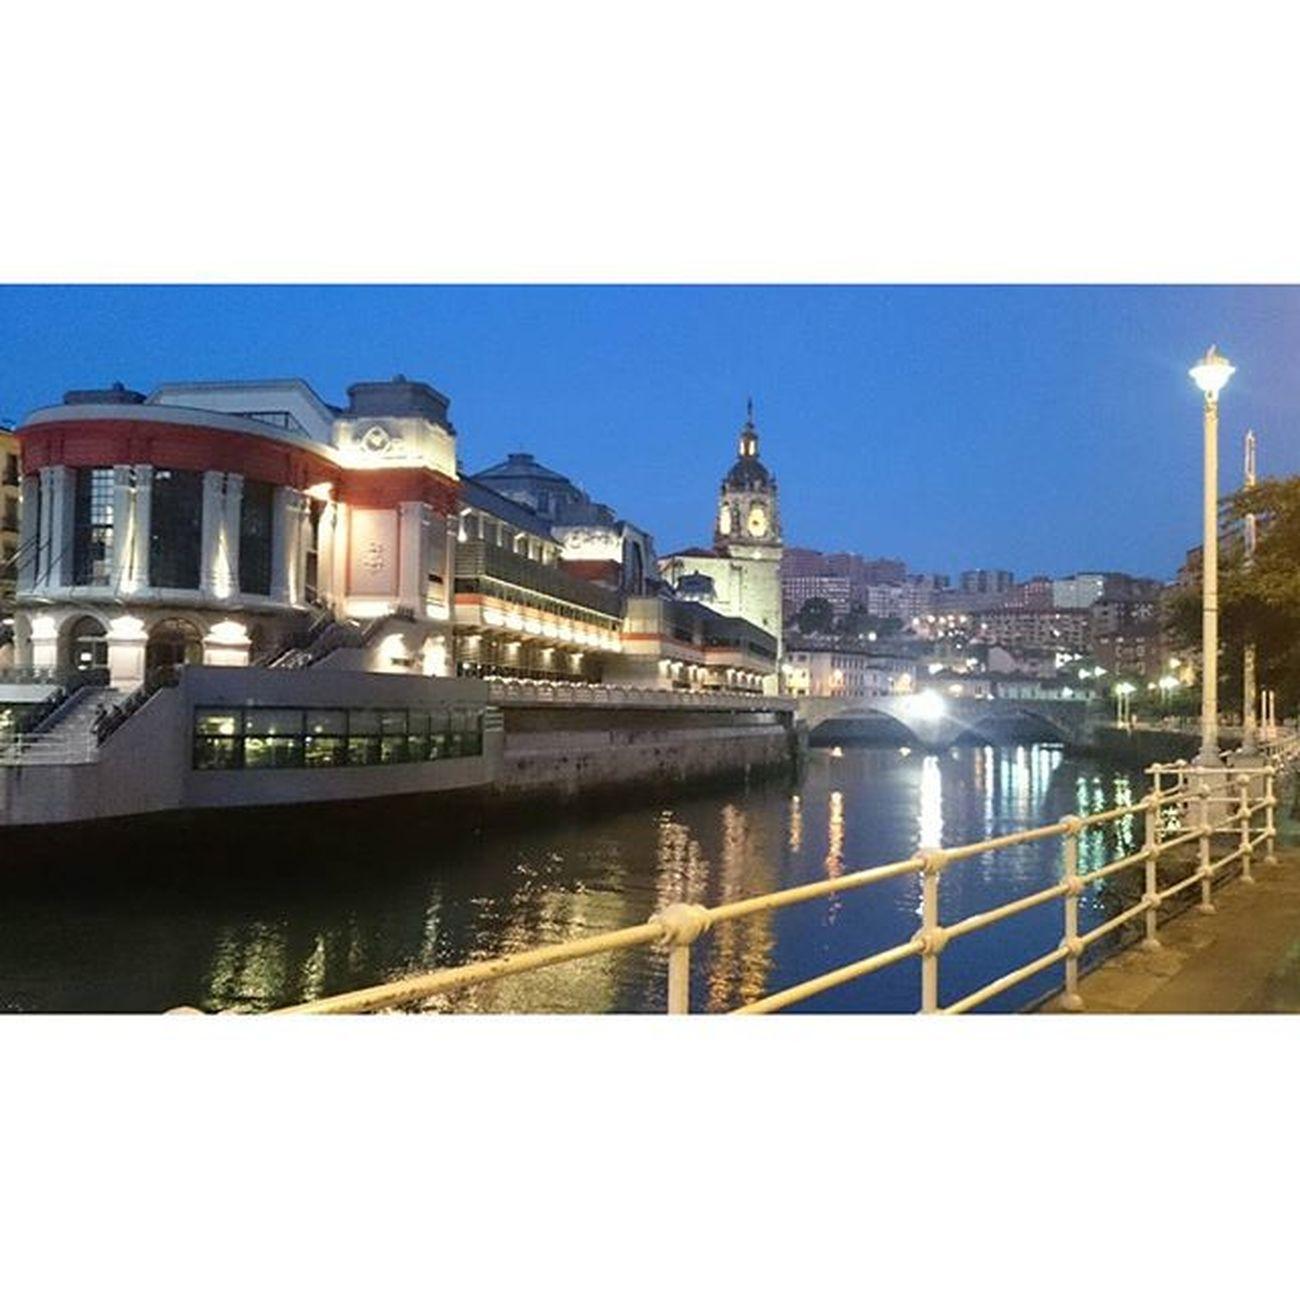 Martzana Verybilbao Bilbao Bilbaolovers Ilovebilbao Bilbaoclick Bilbaocentro Bilbaoarchitecture Euskadi Euskogram Euskadigrafias Paisvasco Summerweather Summer Sky All_shots Like4like Picoftheday Photooftheday